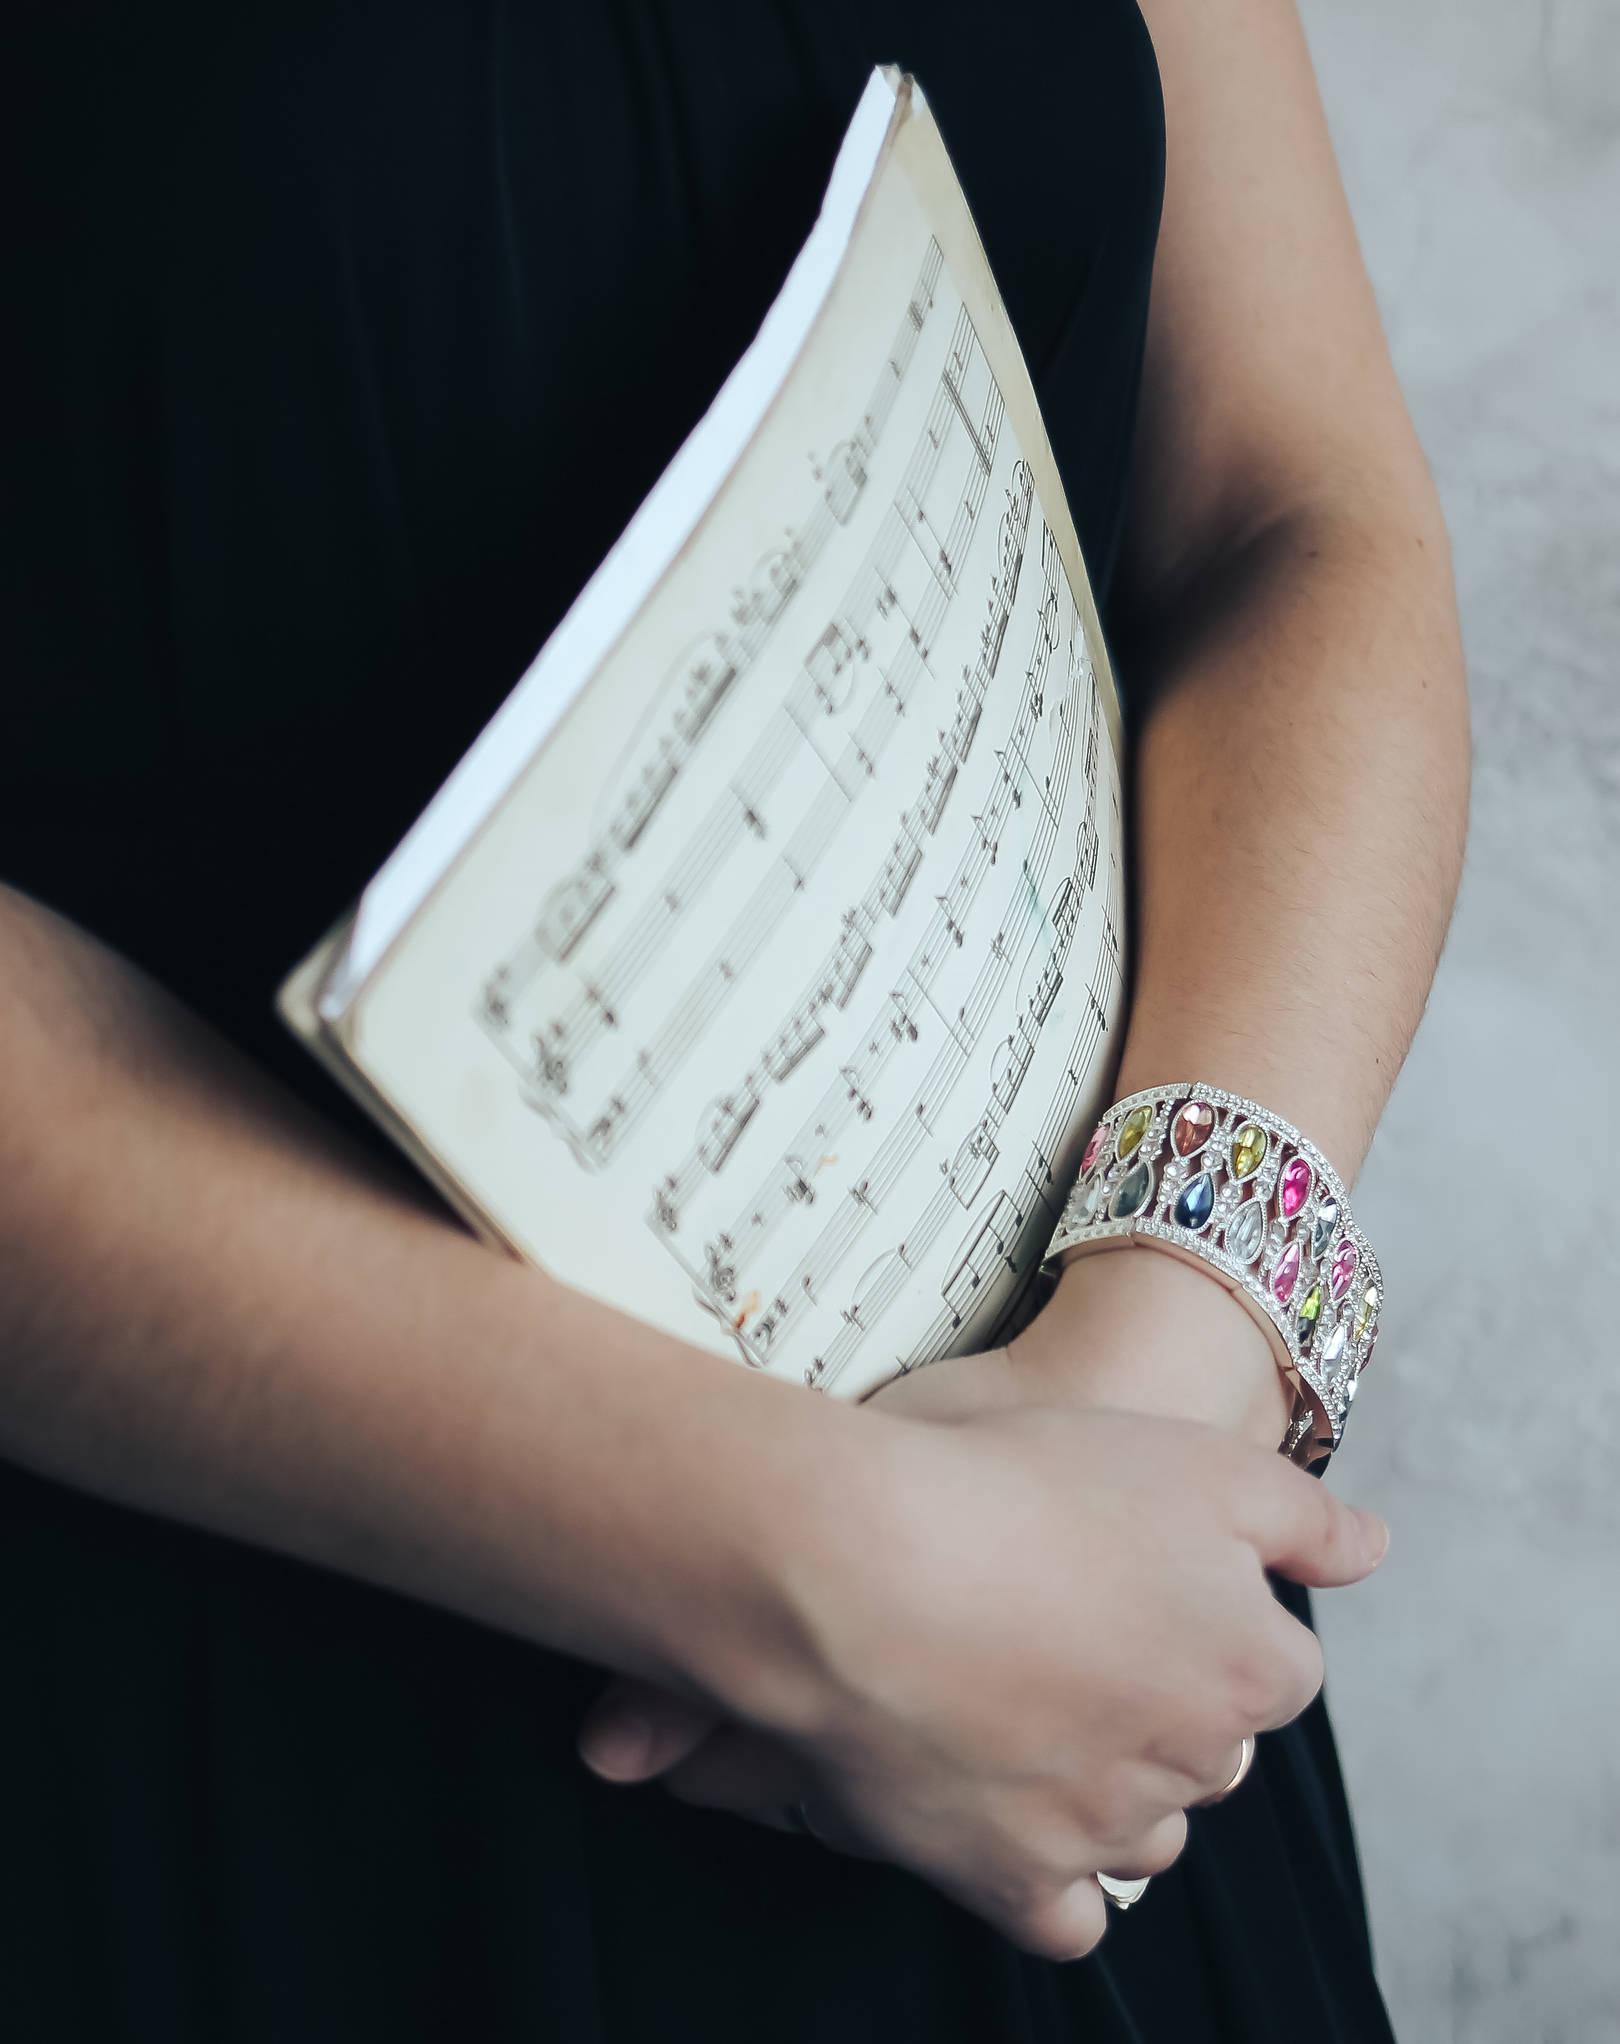 У музыканта тонкая душа...